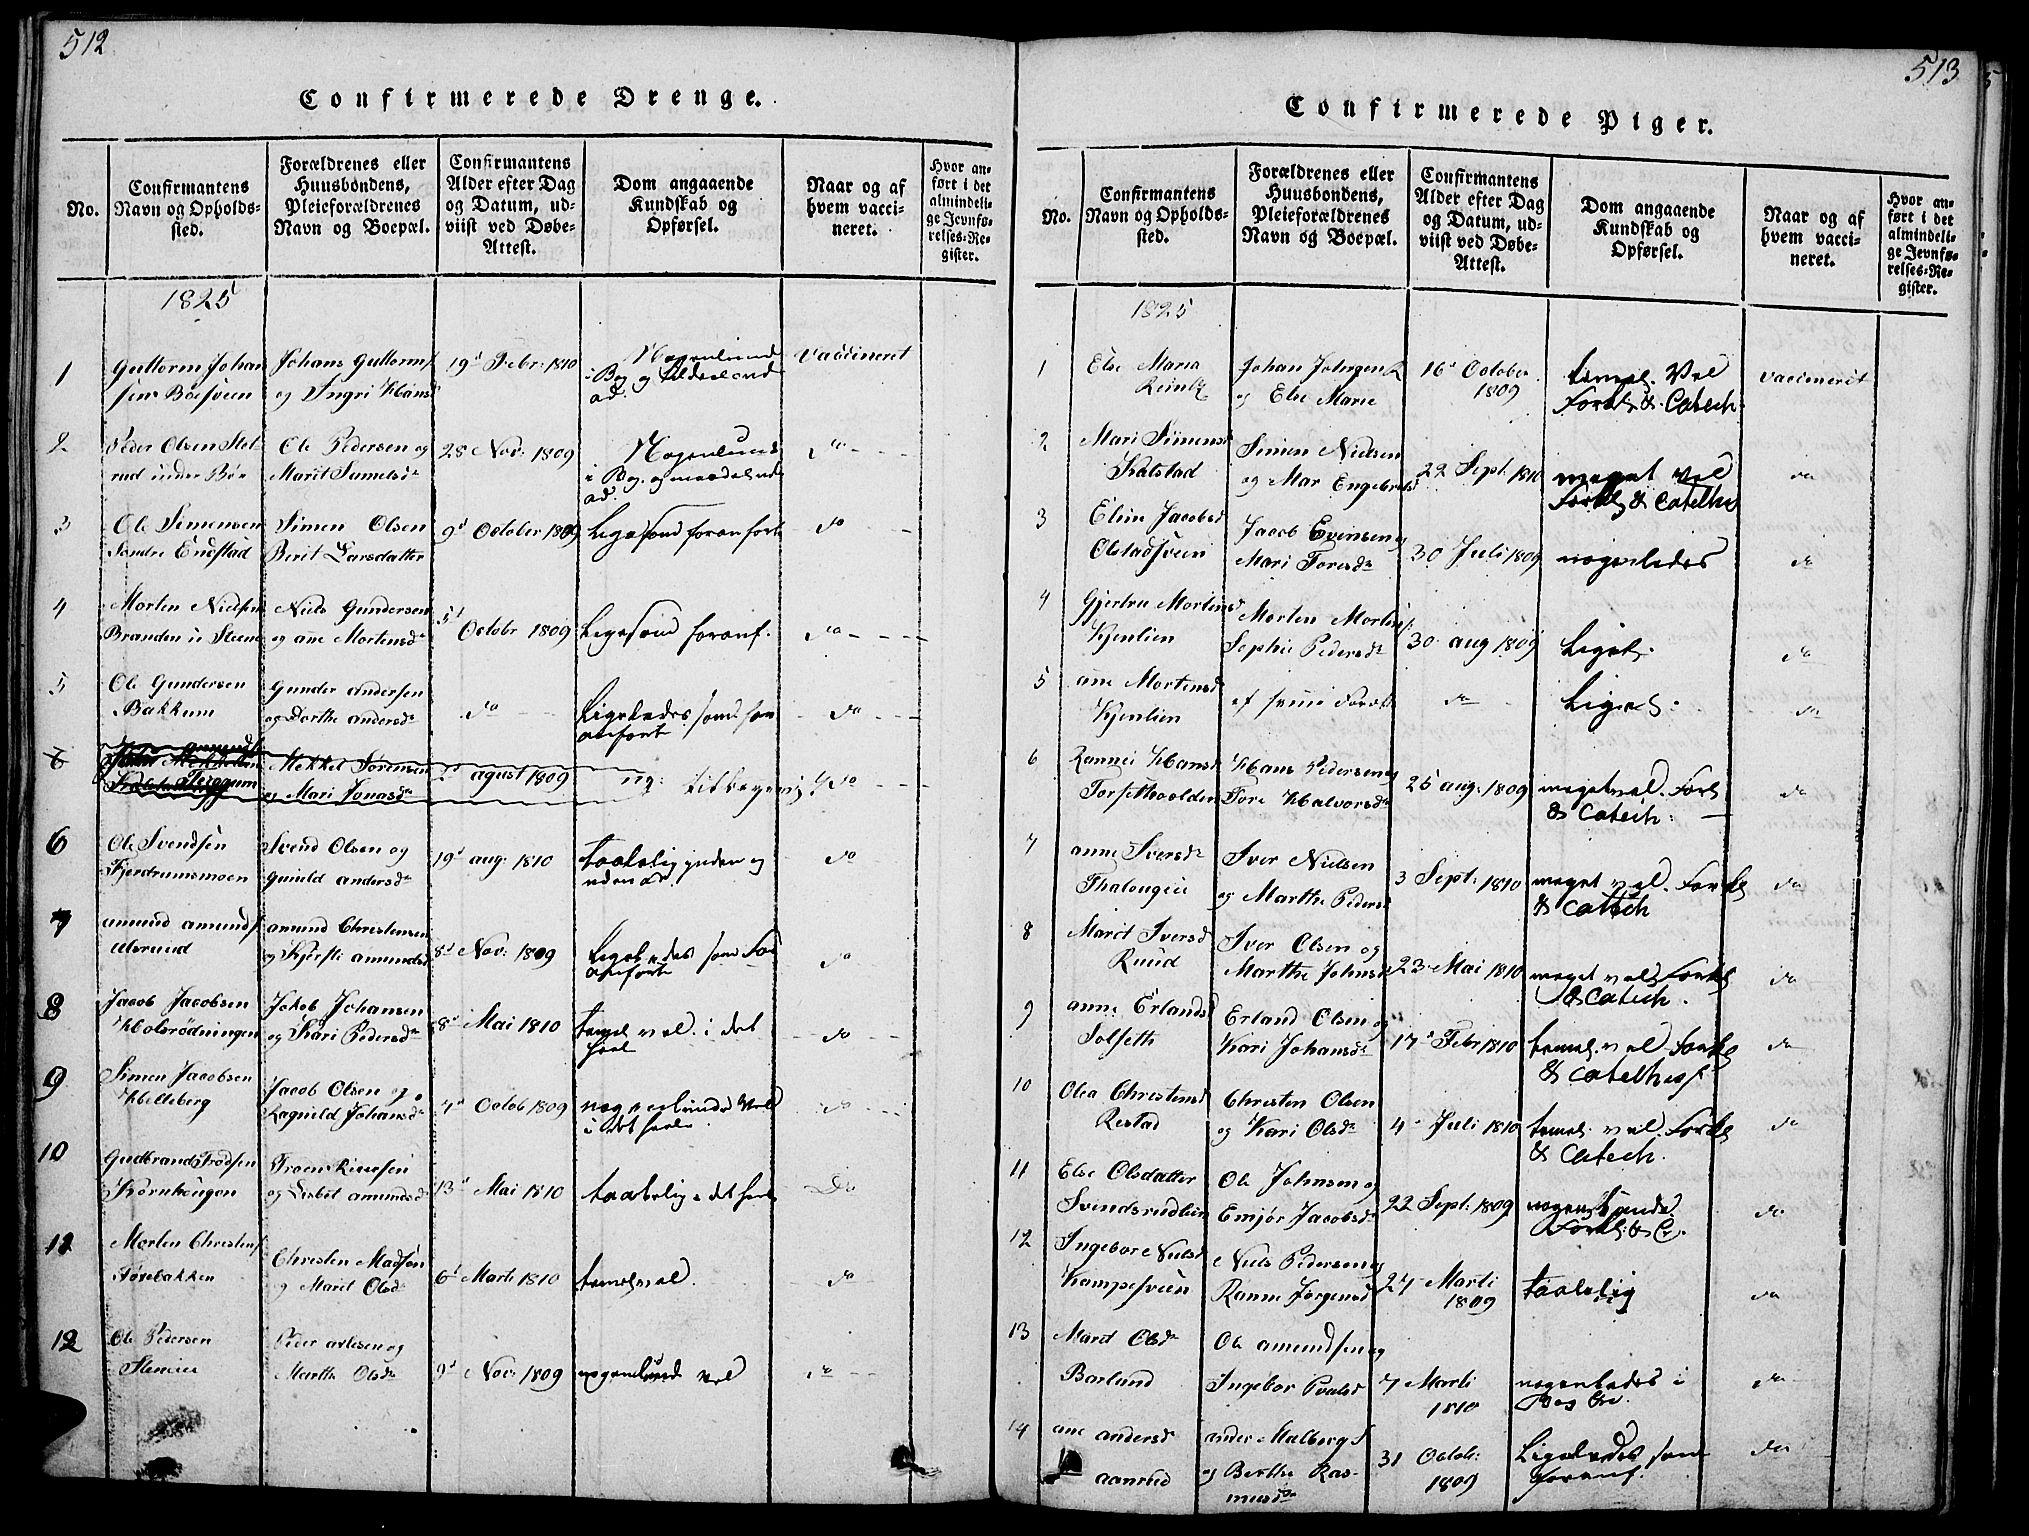 SAH, Gausdal prestekontor, Ministerialbok nr. 5, 1817-1829, s. 512-513